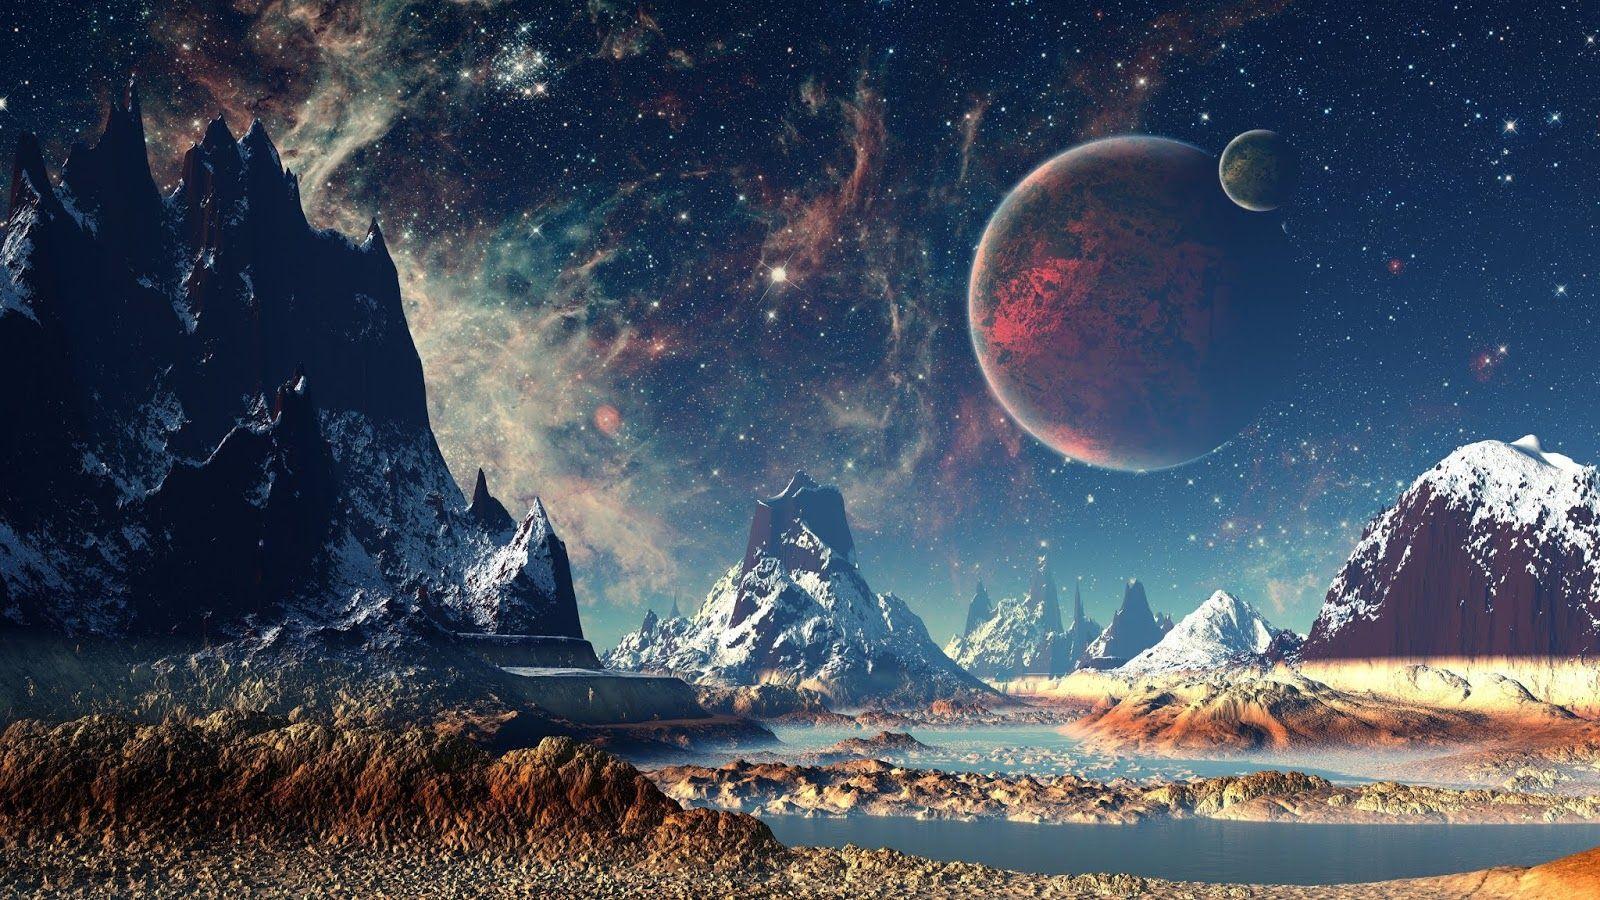 4k Ultra Hd Planets Wallpapers Top Free 4k Ultra Hd Planets Backgrounds Wallpaperaccess